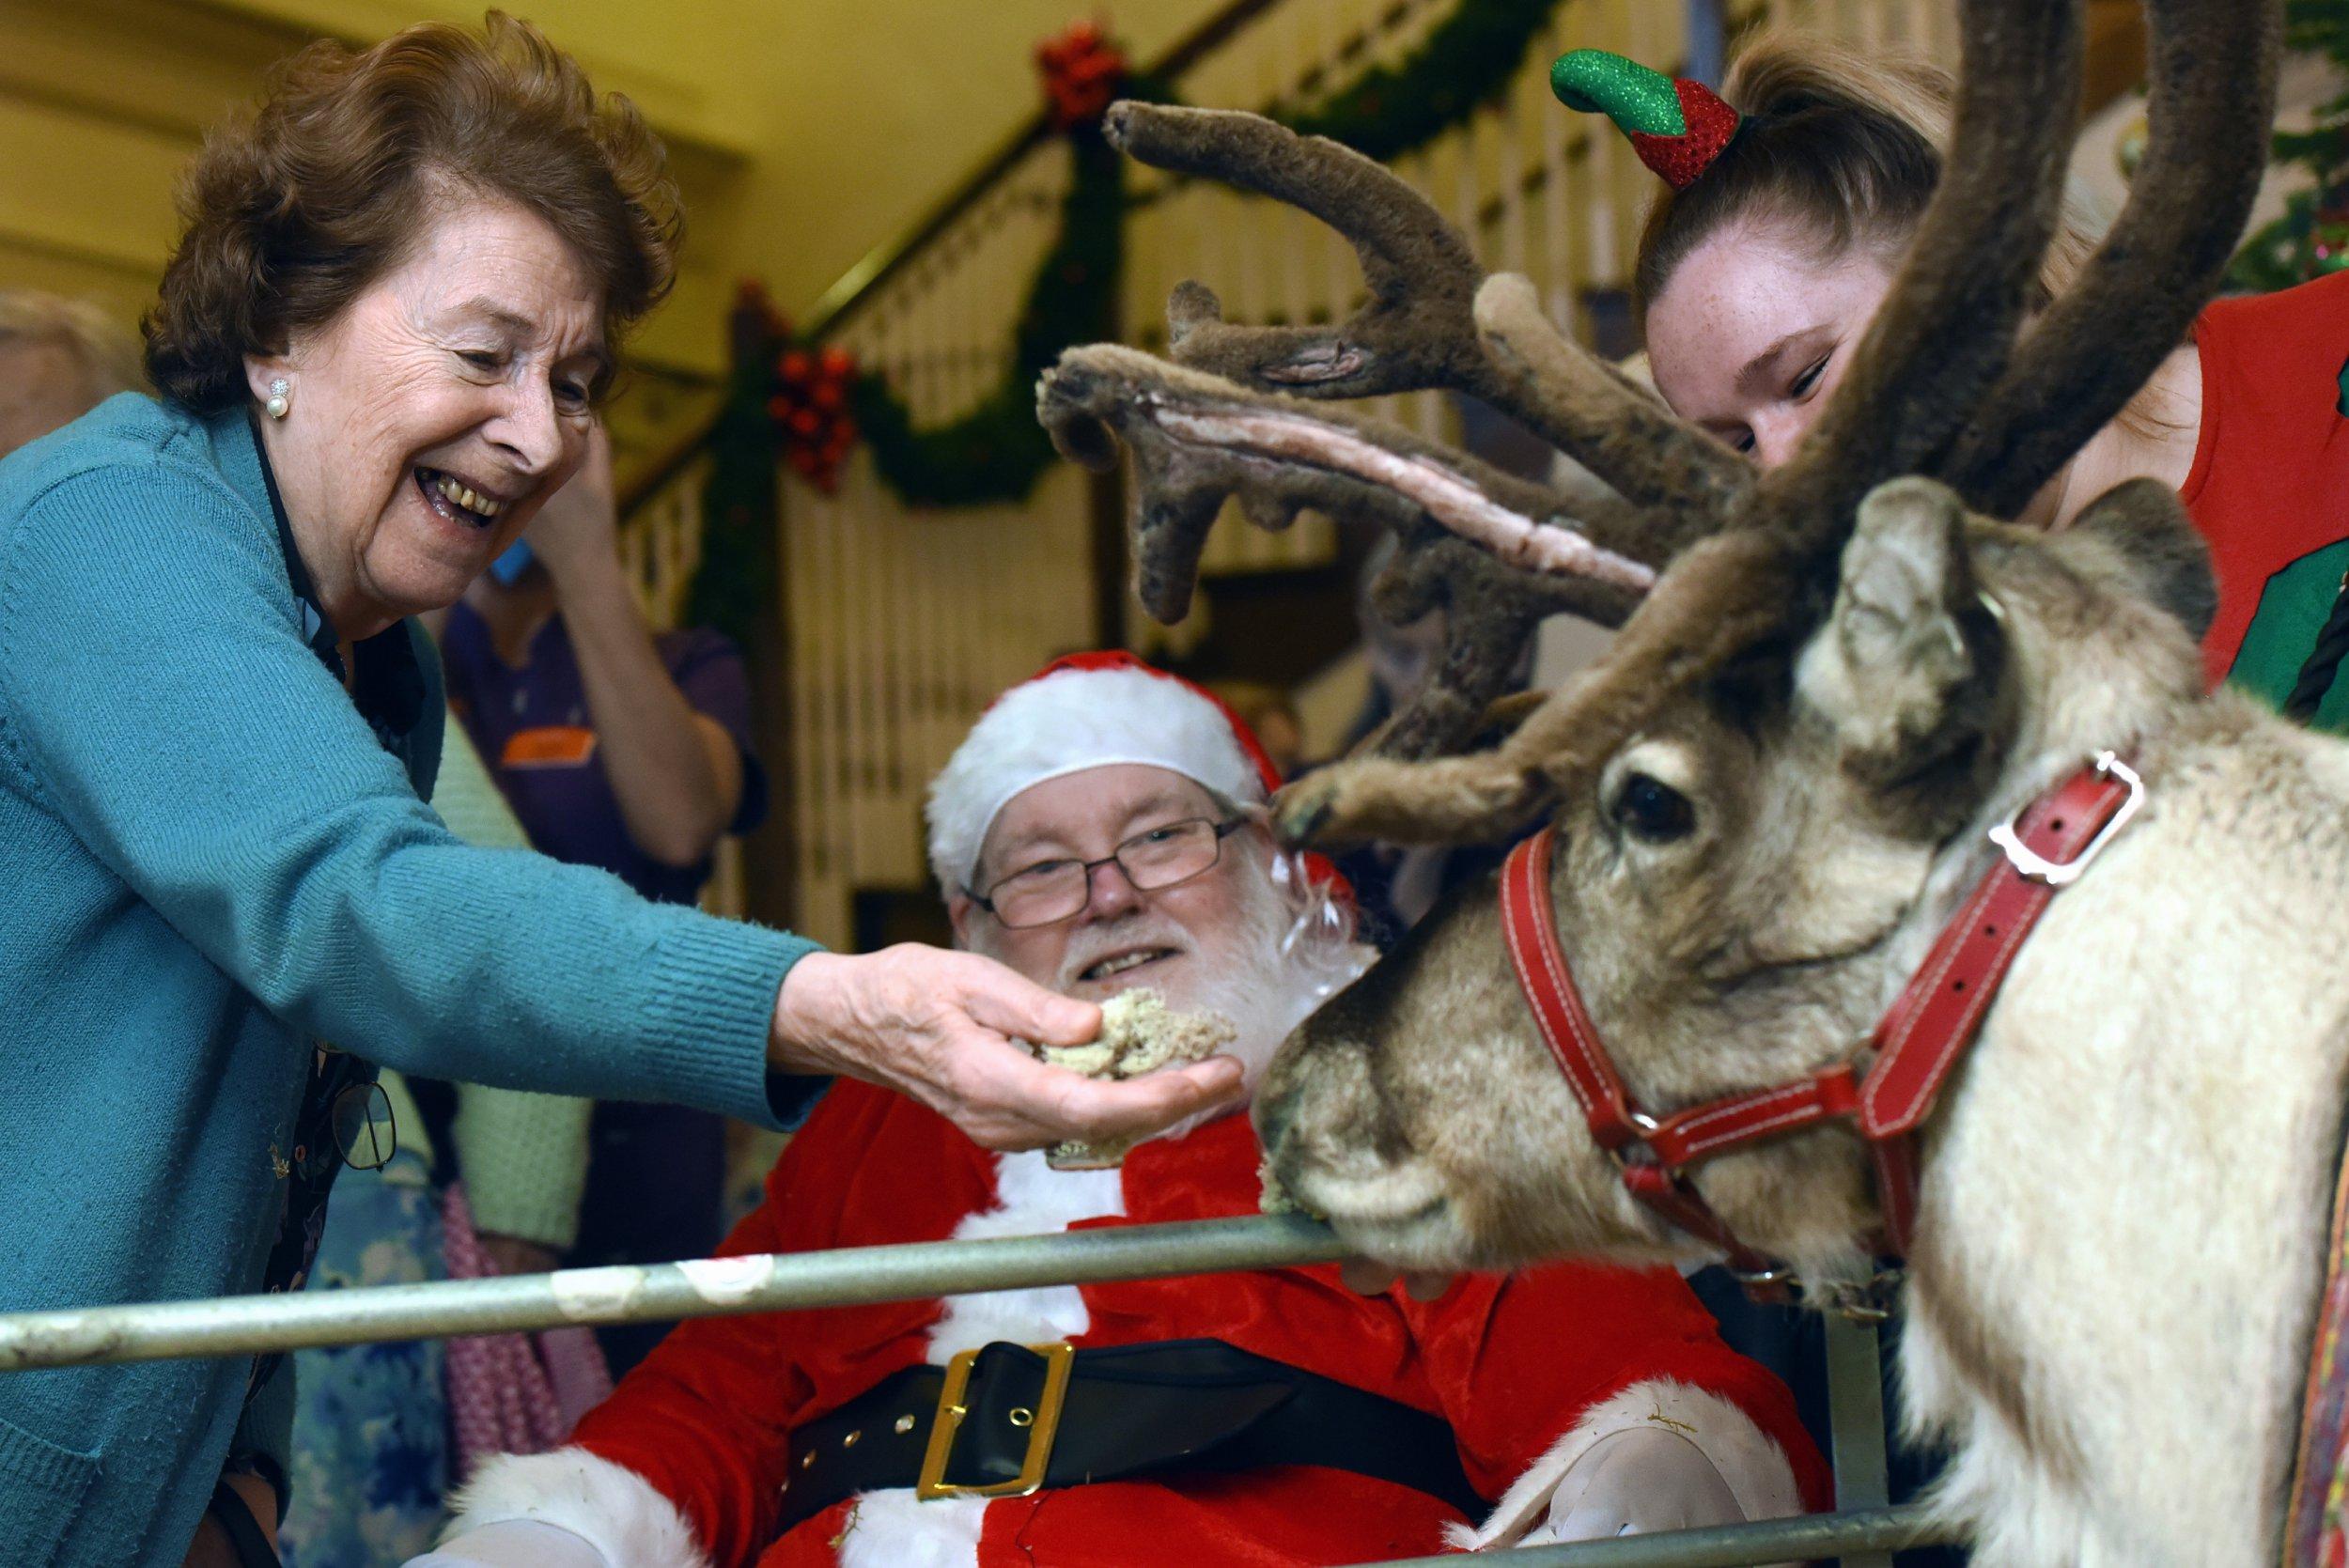 Sunrise Senior Living, Edgbaston, Birmingham, where Rudolph the reindeer was visiting the residents. Barbara Fox, aged 88, left, enjoys feeding moss the reindeer.